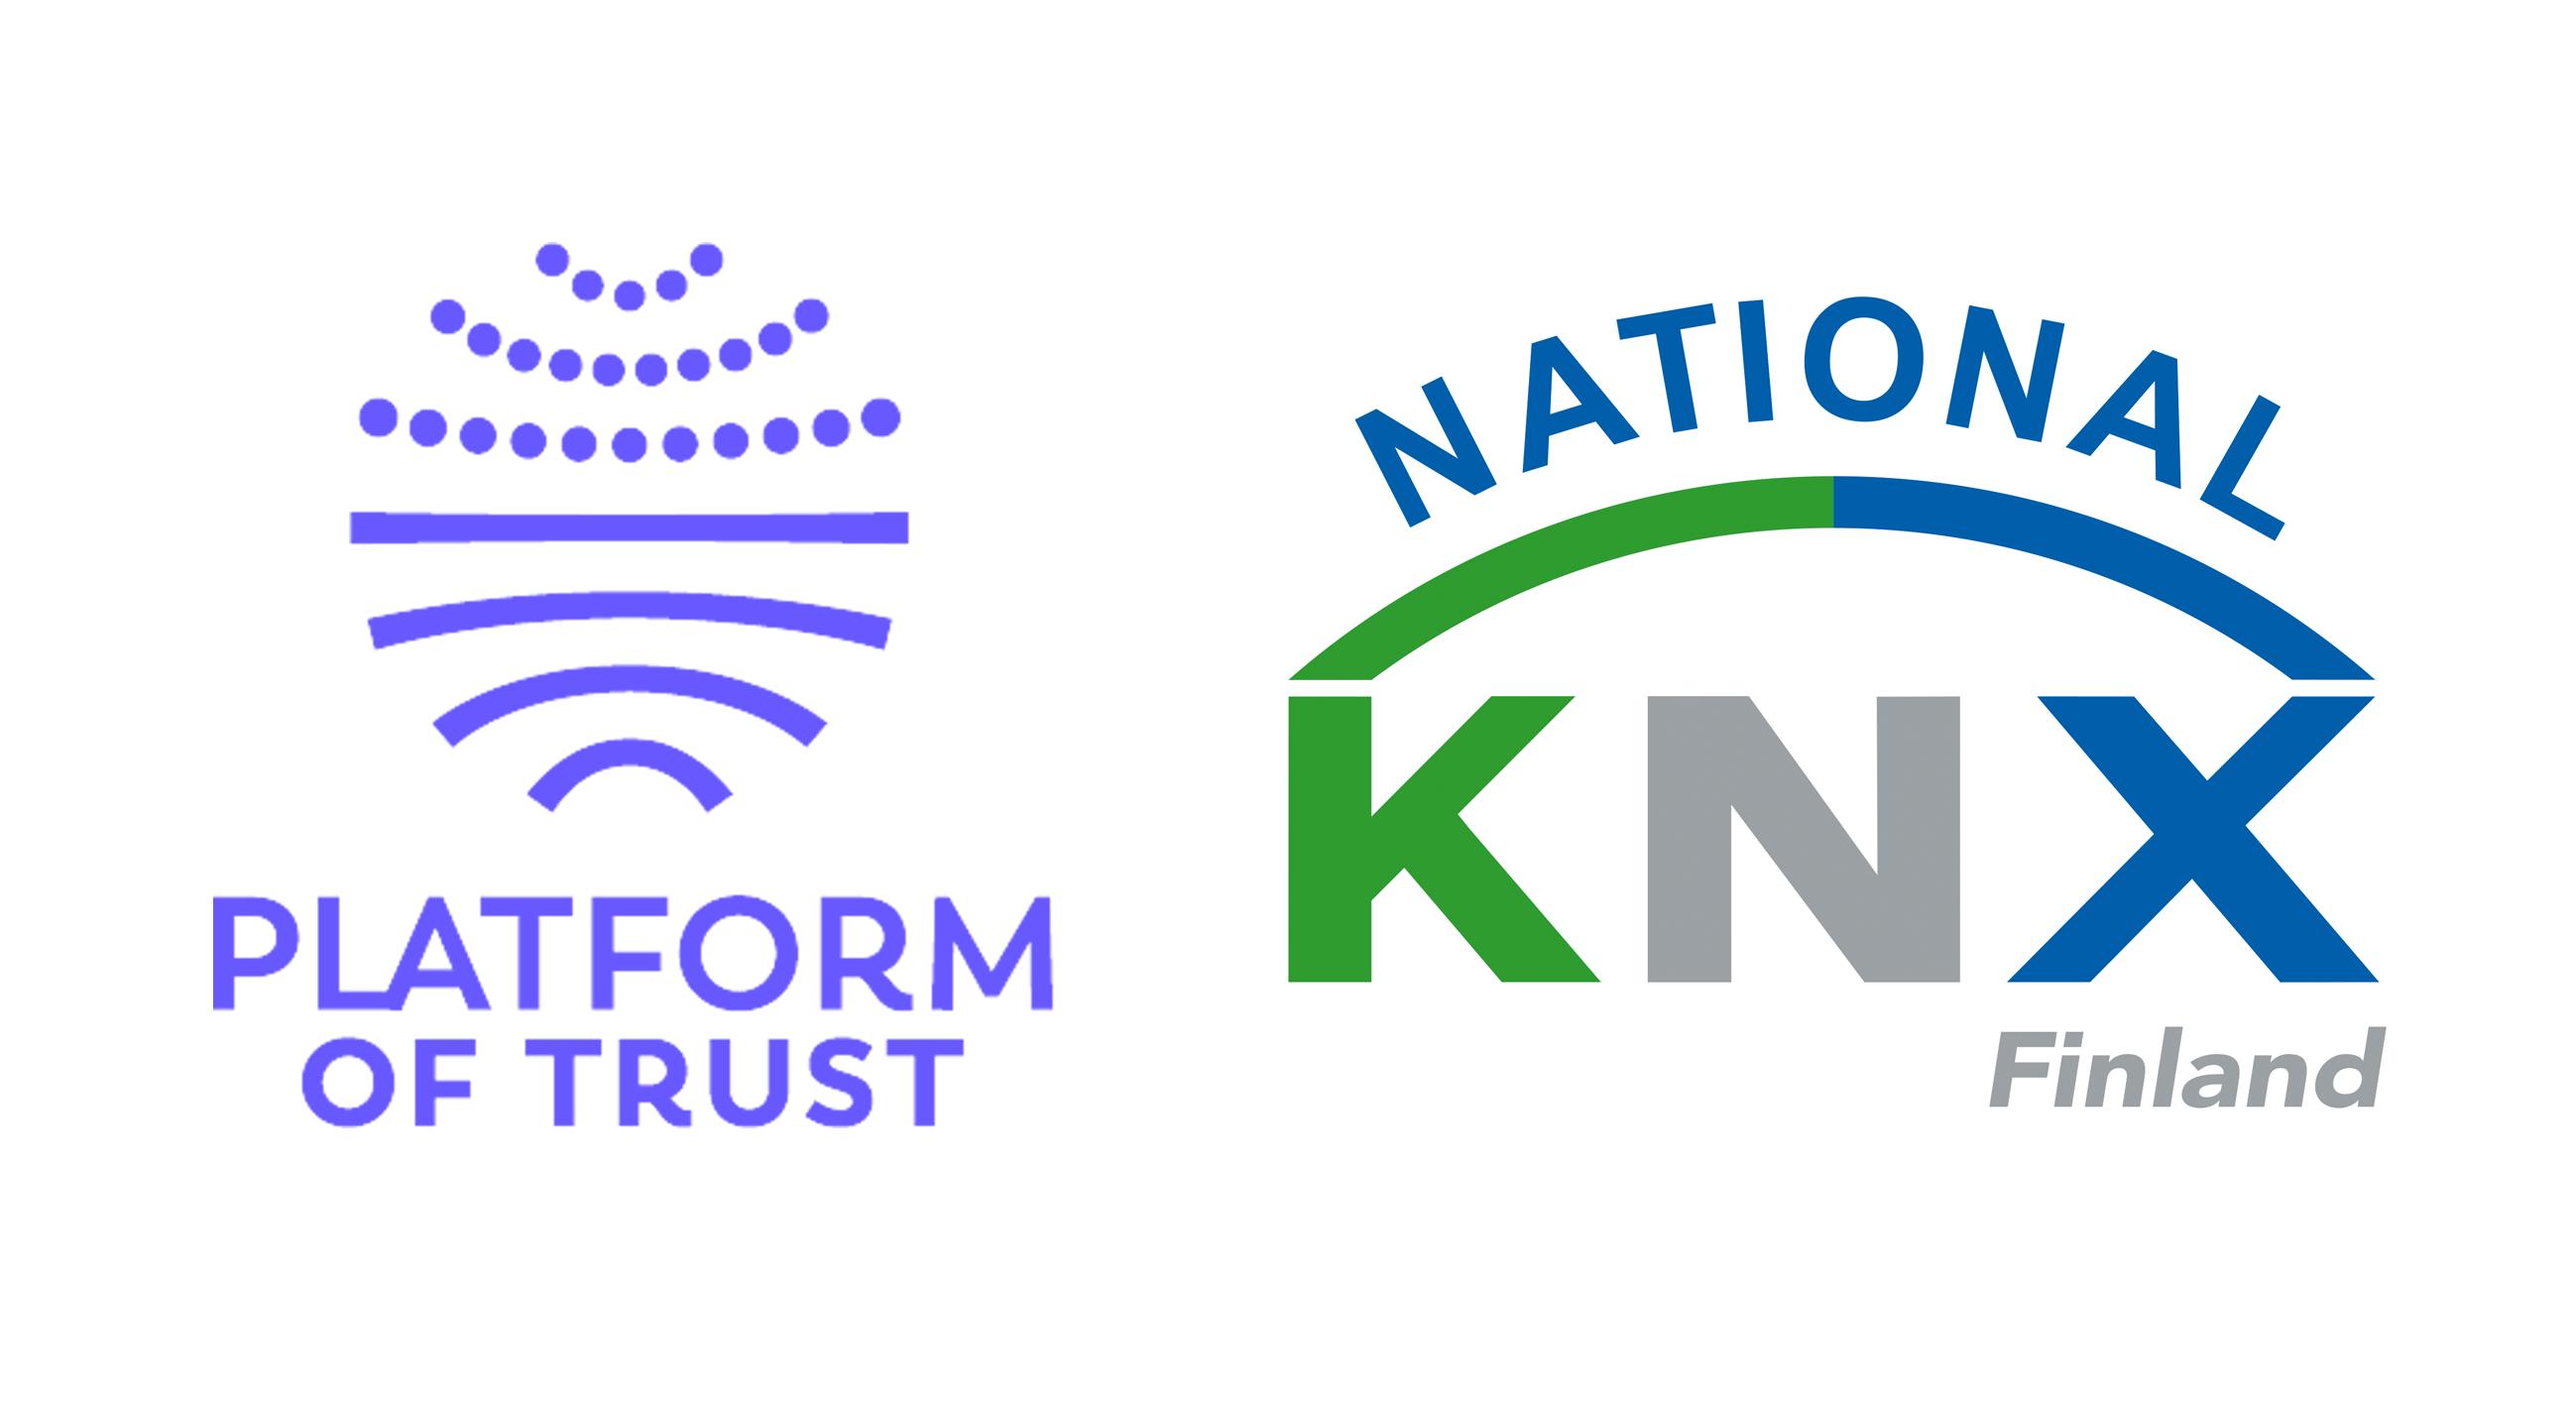 Platform of Trust and KNX